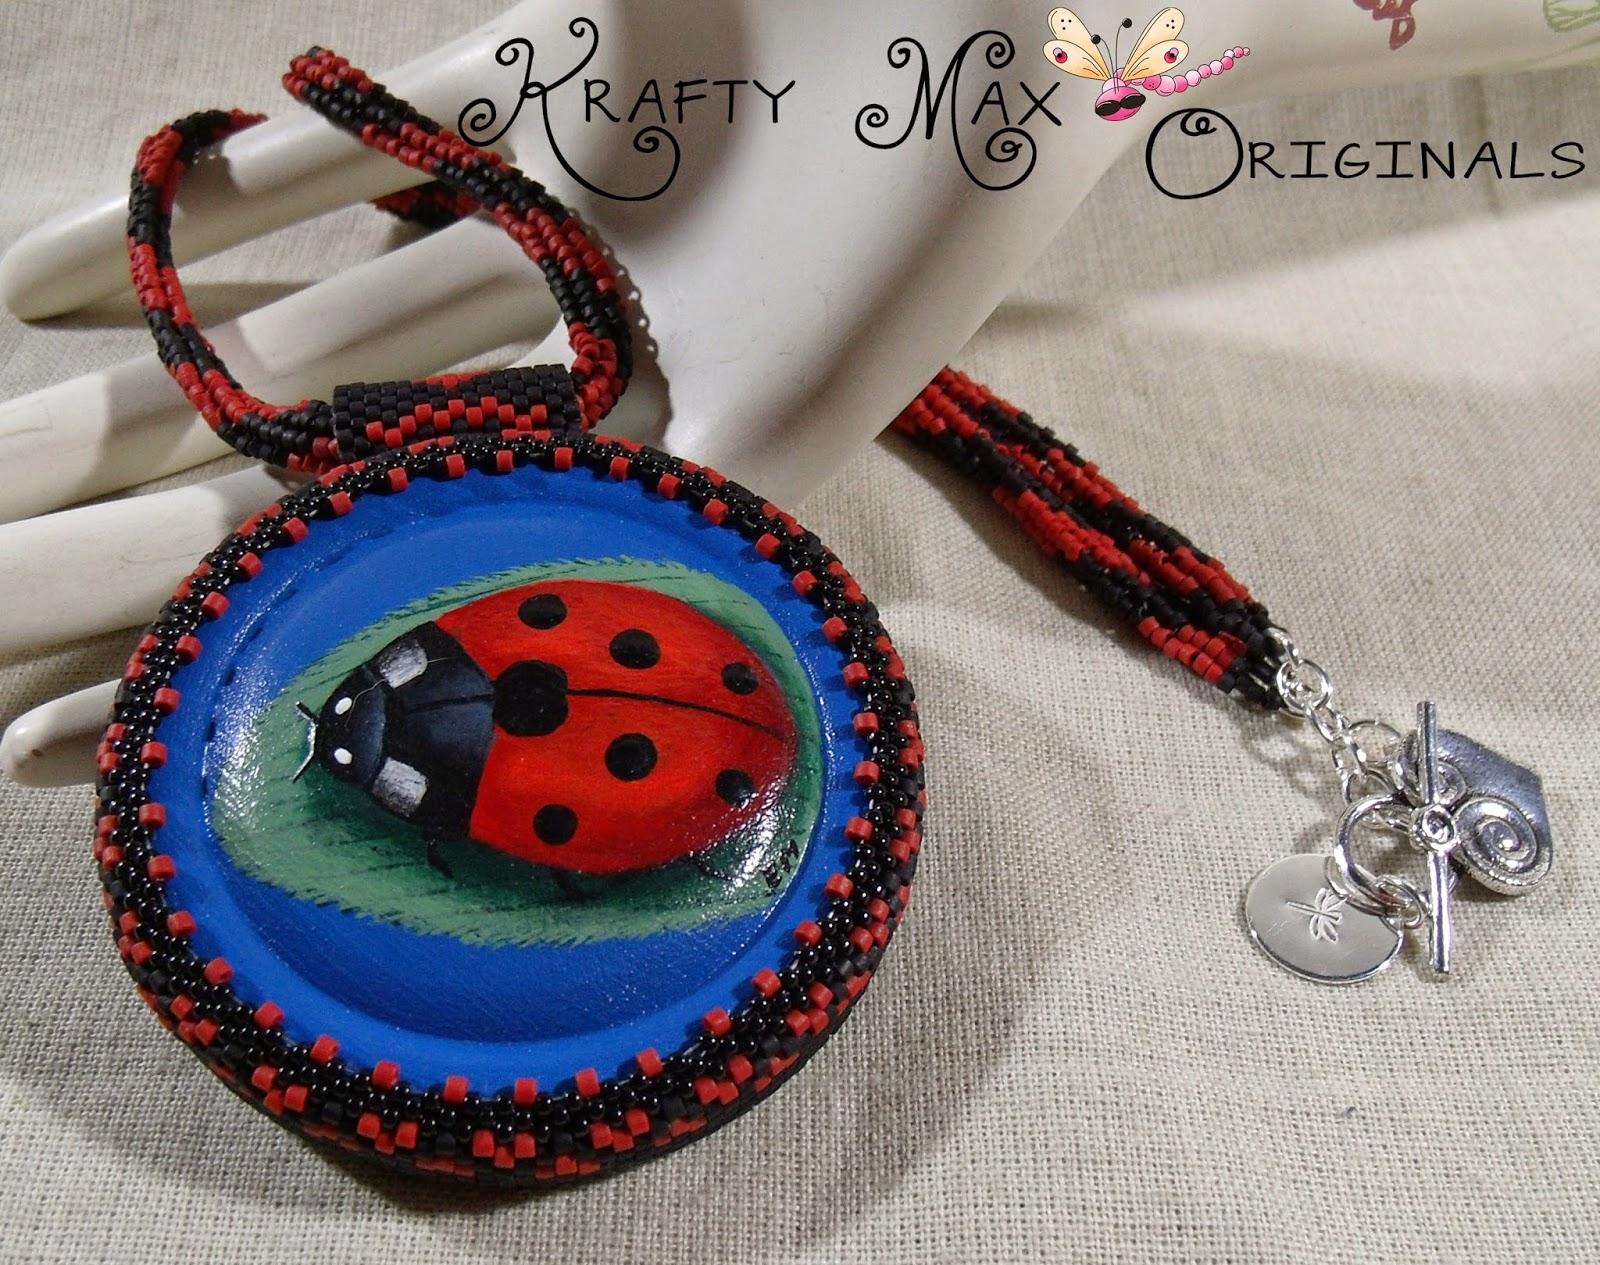 http://www.artfire.com/ext/shop/product_view/9866405